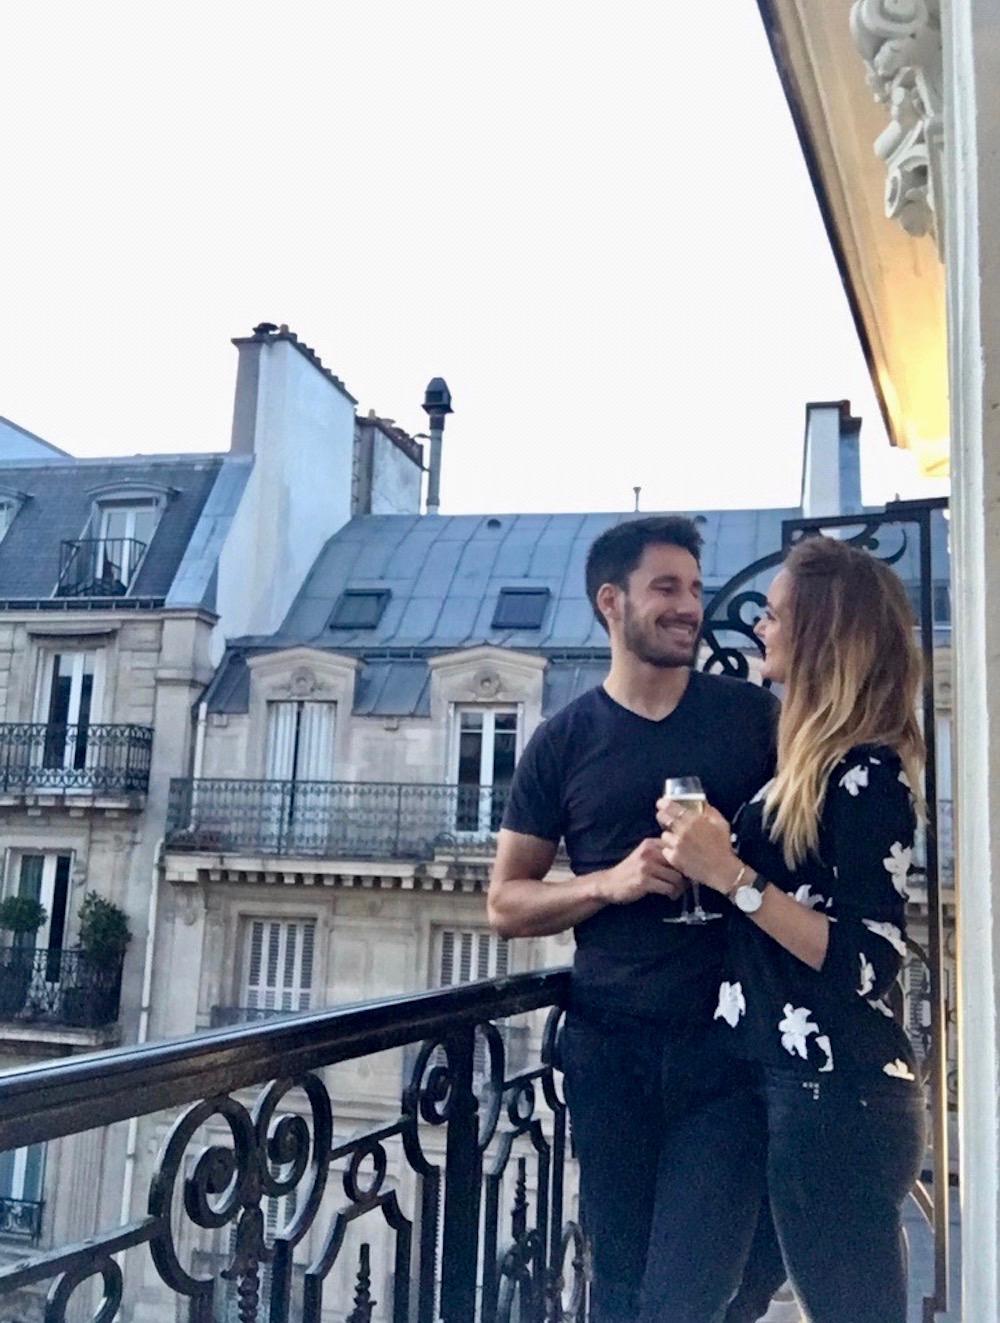 staycation-week-end-amoureux-paris-idee-surprendre-amoureux-balcon-vue-champagne